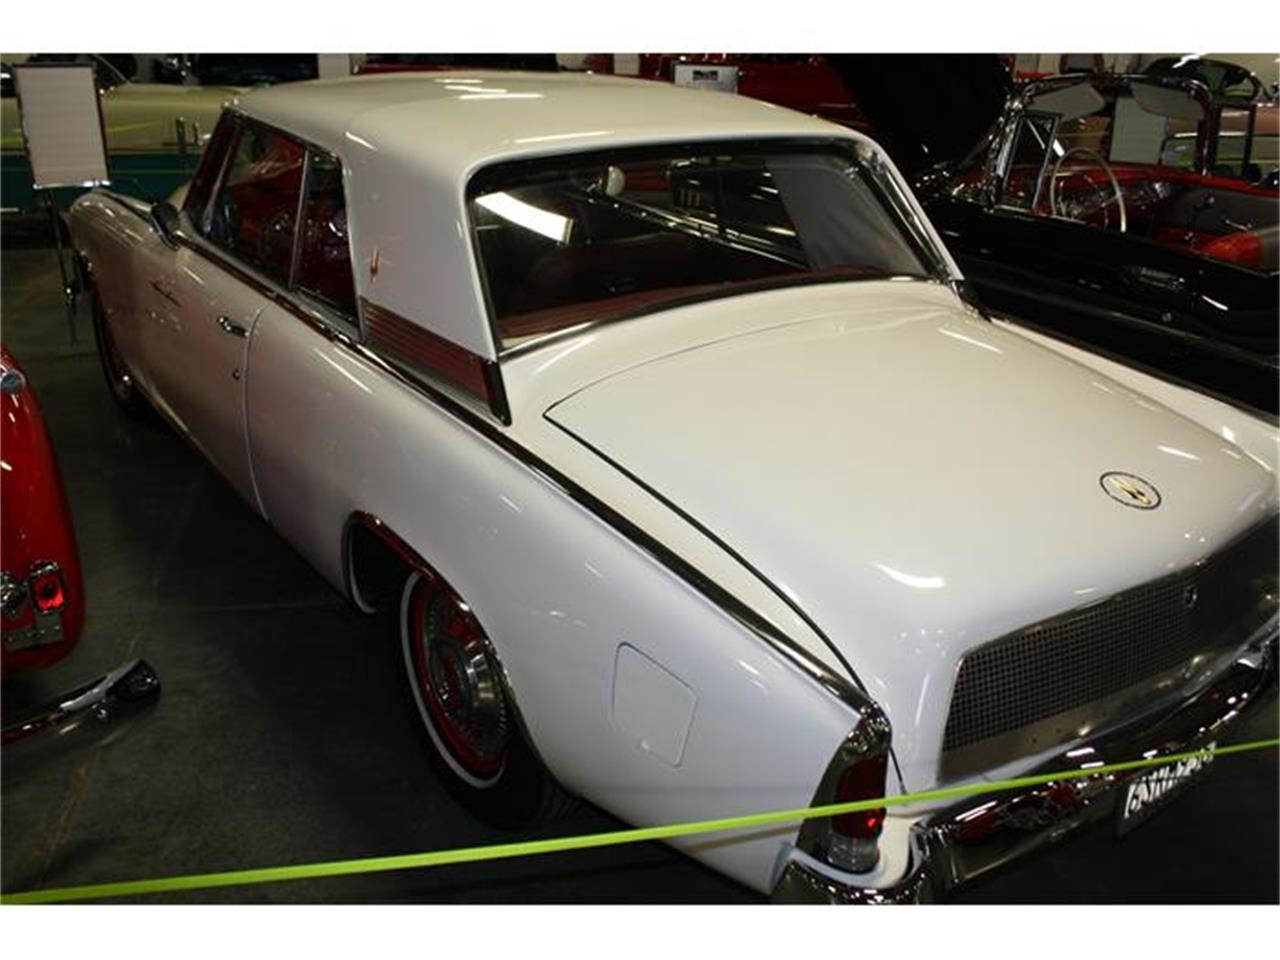 Large Picture of 1962 Gran Turismo located in Branson Missouri - $25,000.00 Offered by Branson Auto & Farm Museum - EU1C